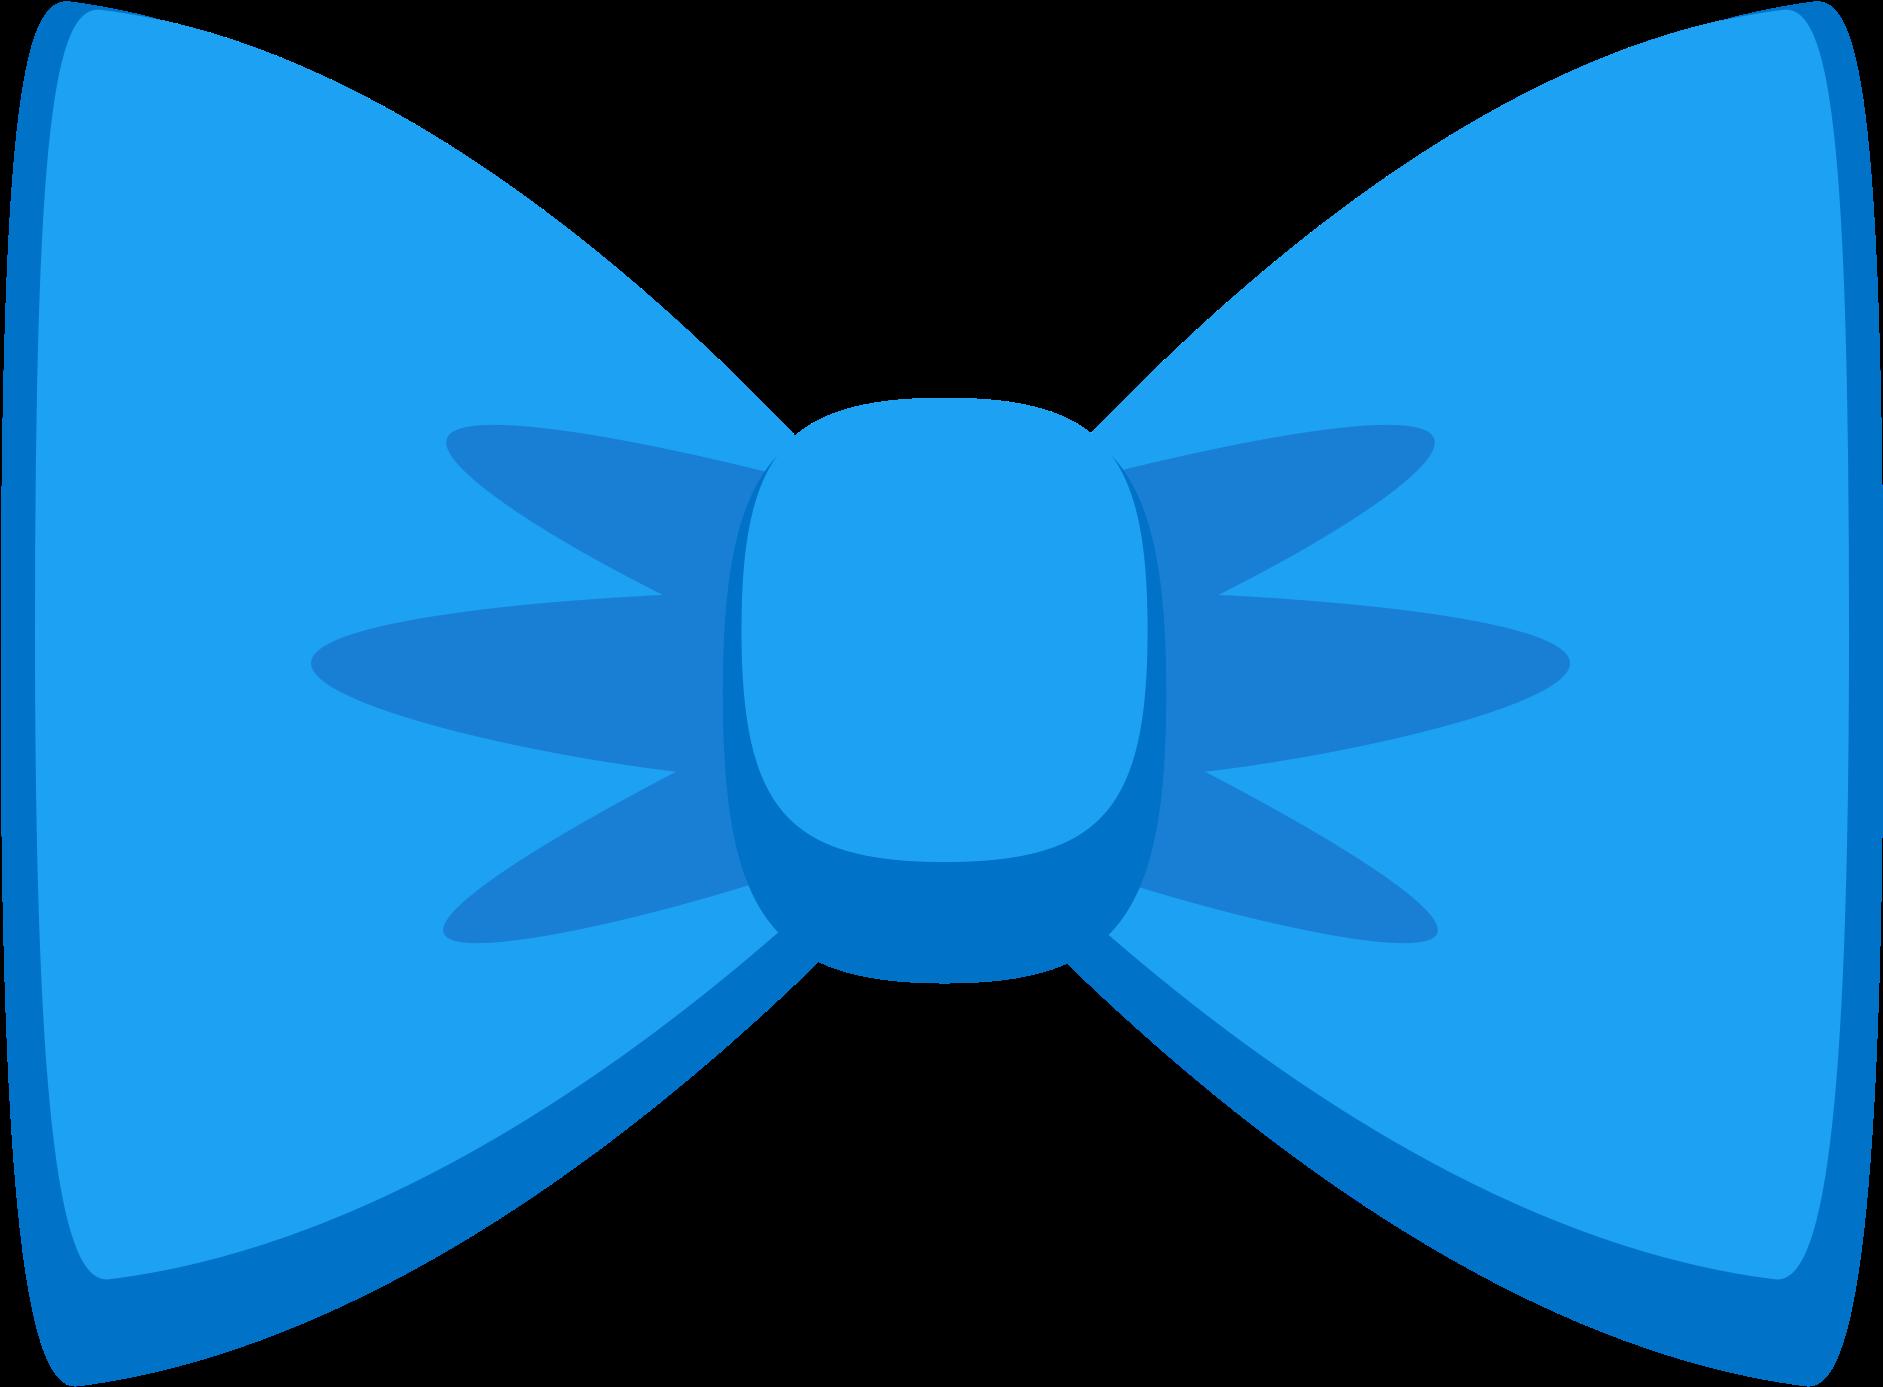 Bowtie - Blue Bow Tie Stickers , Transparent Cartoon - Jing.fm